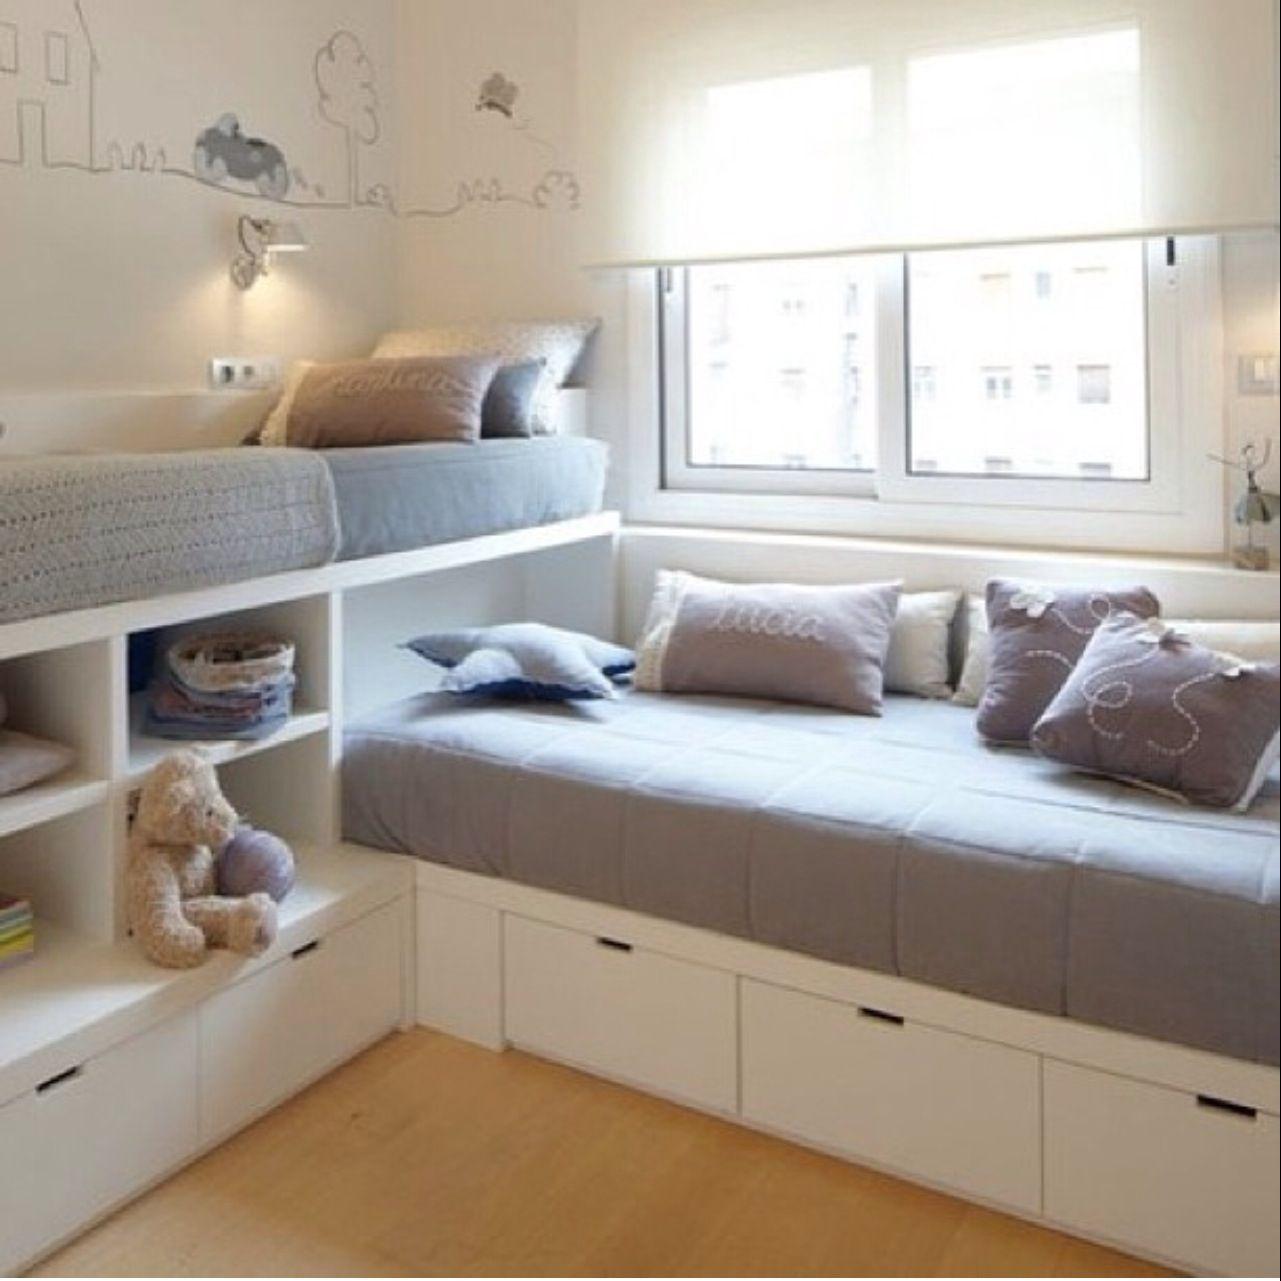 Baby Bedroom Furniture Nz Bedroom Storage Cupboards Bedroom Wallpaper Hd Male Bedroom Paint Ideas: Quartos Com Beliche, Quartos E